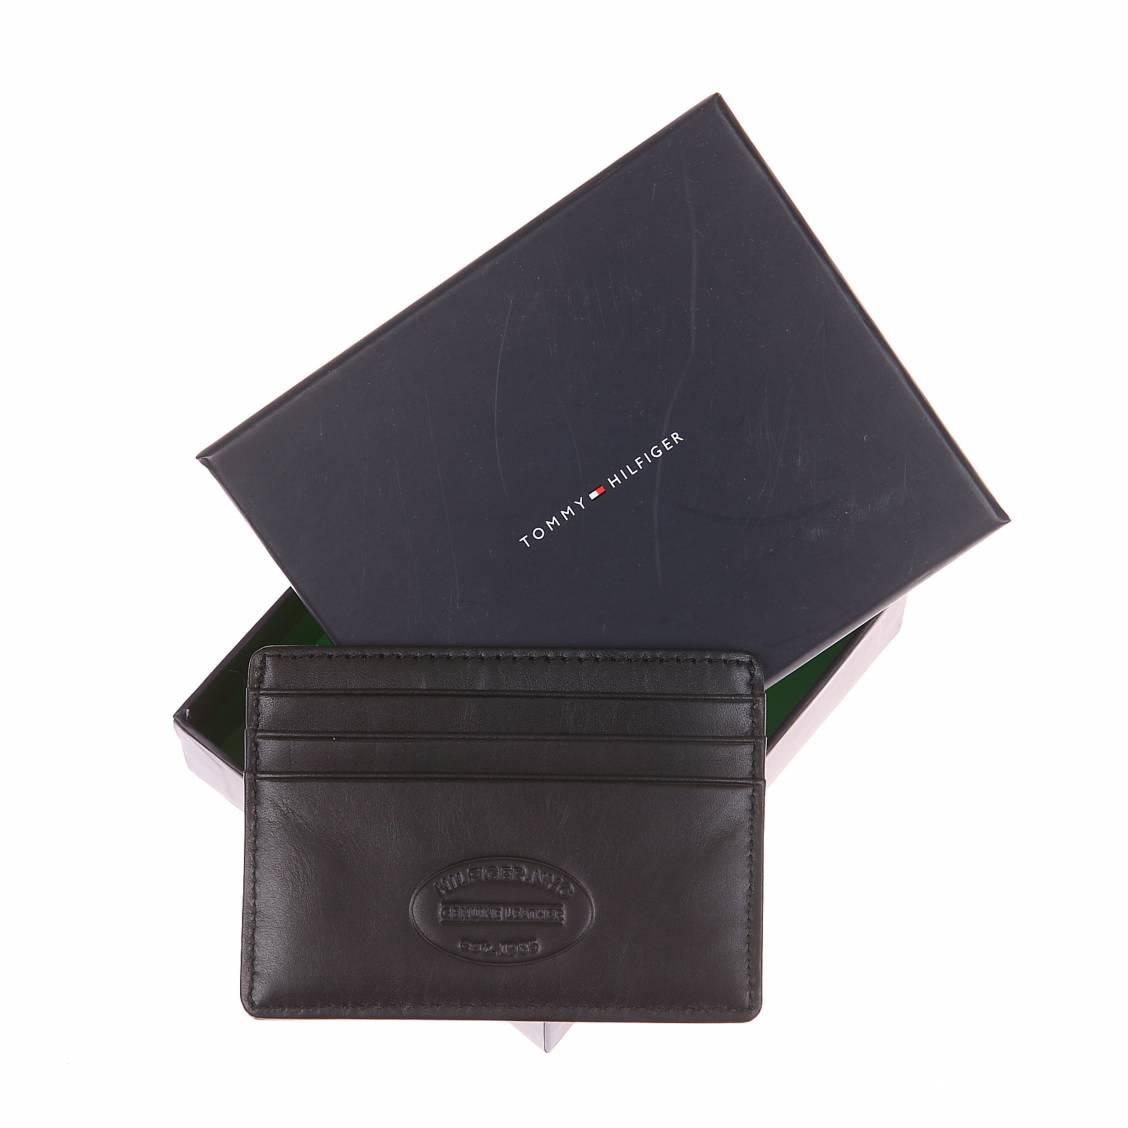 porte-cartes Tommy Hilfiger en cuir noir